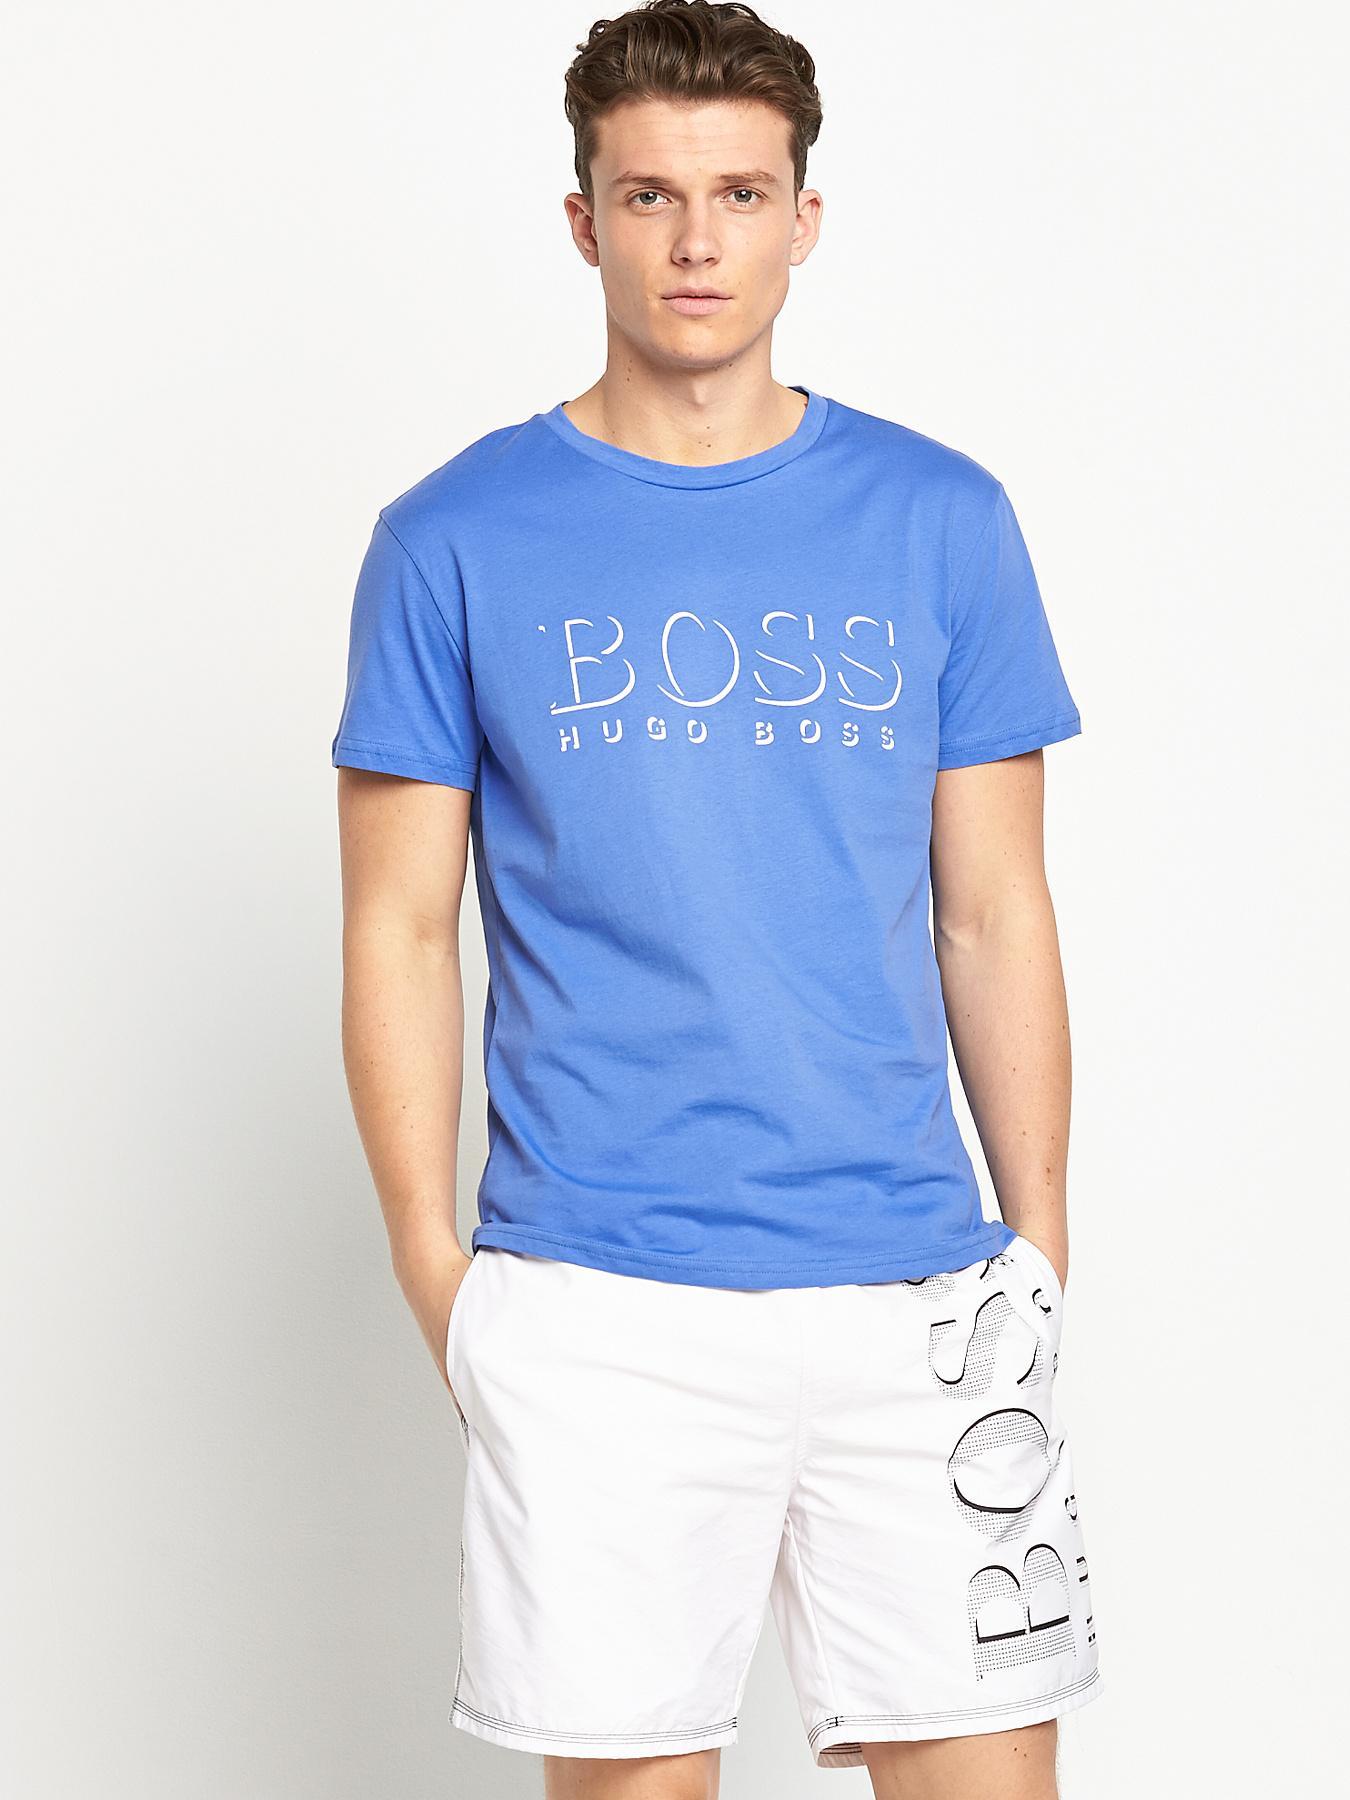 Hugo Boss Mens Short Sleeve T-shirt - Blue - Blue, Blue